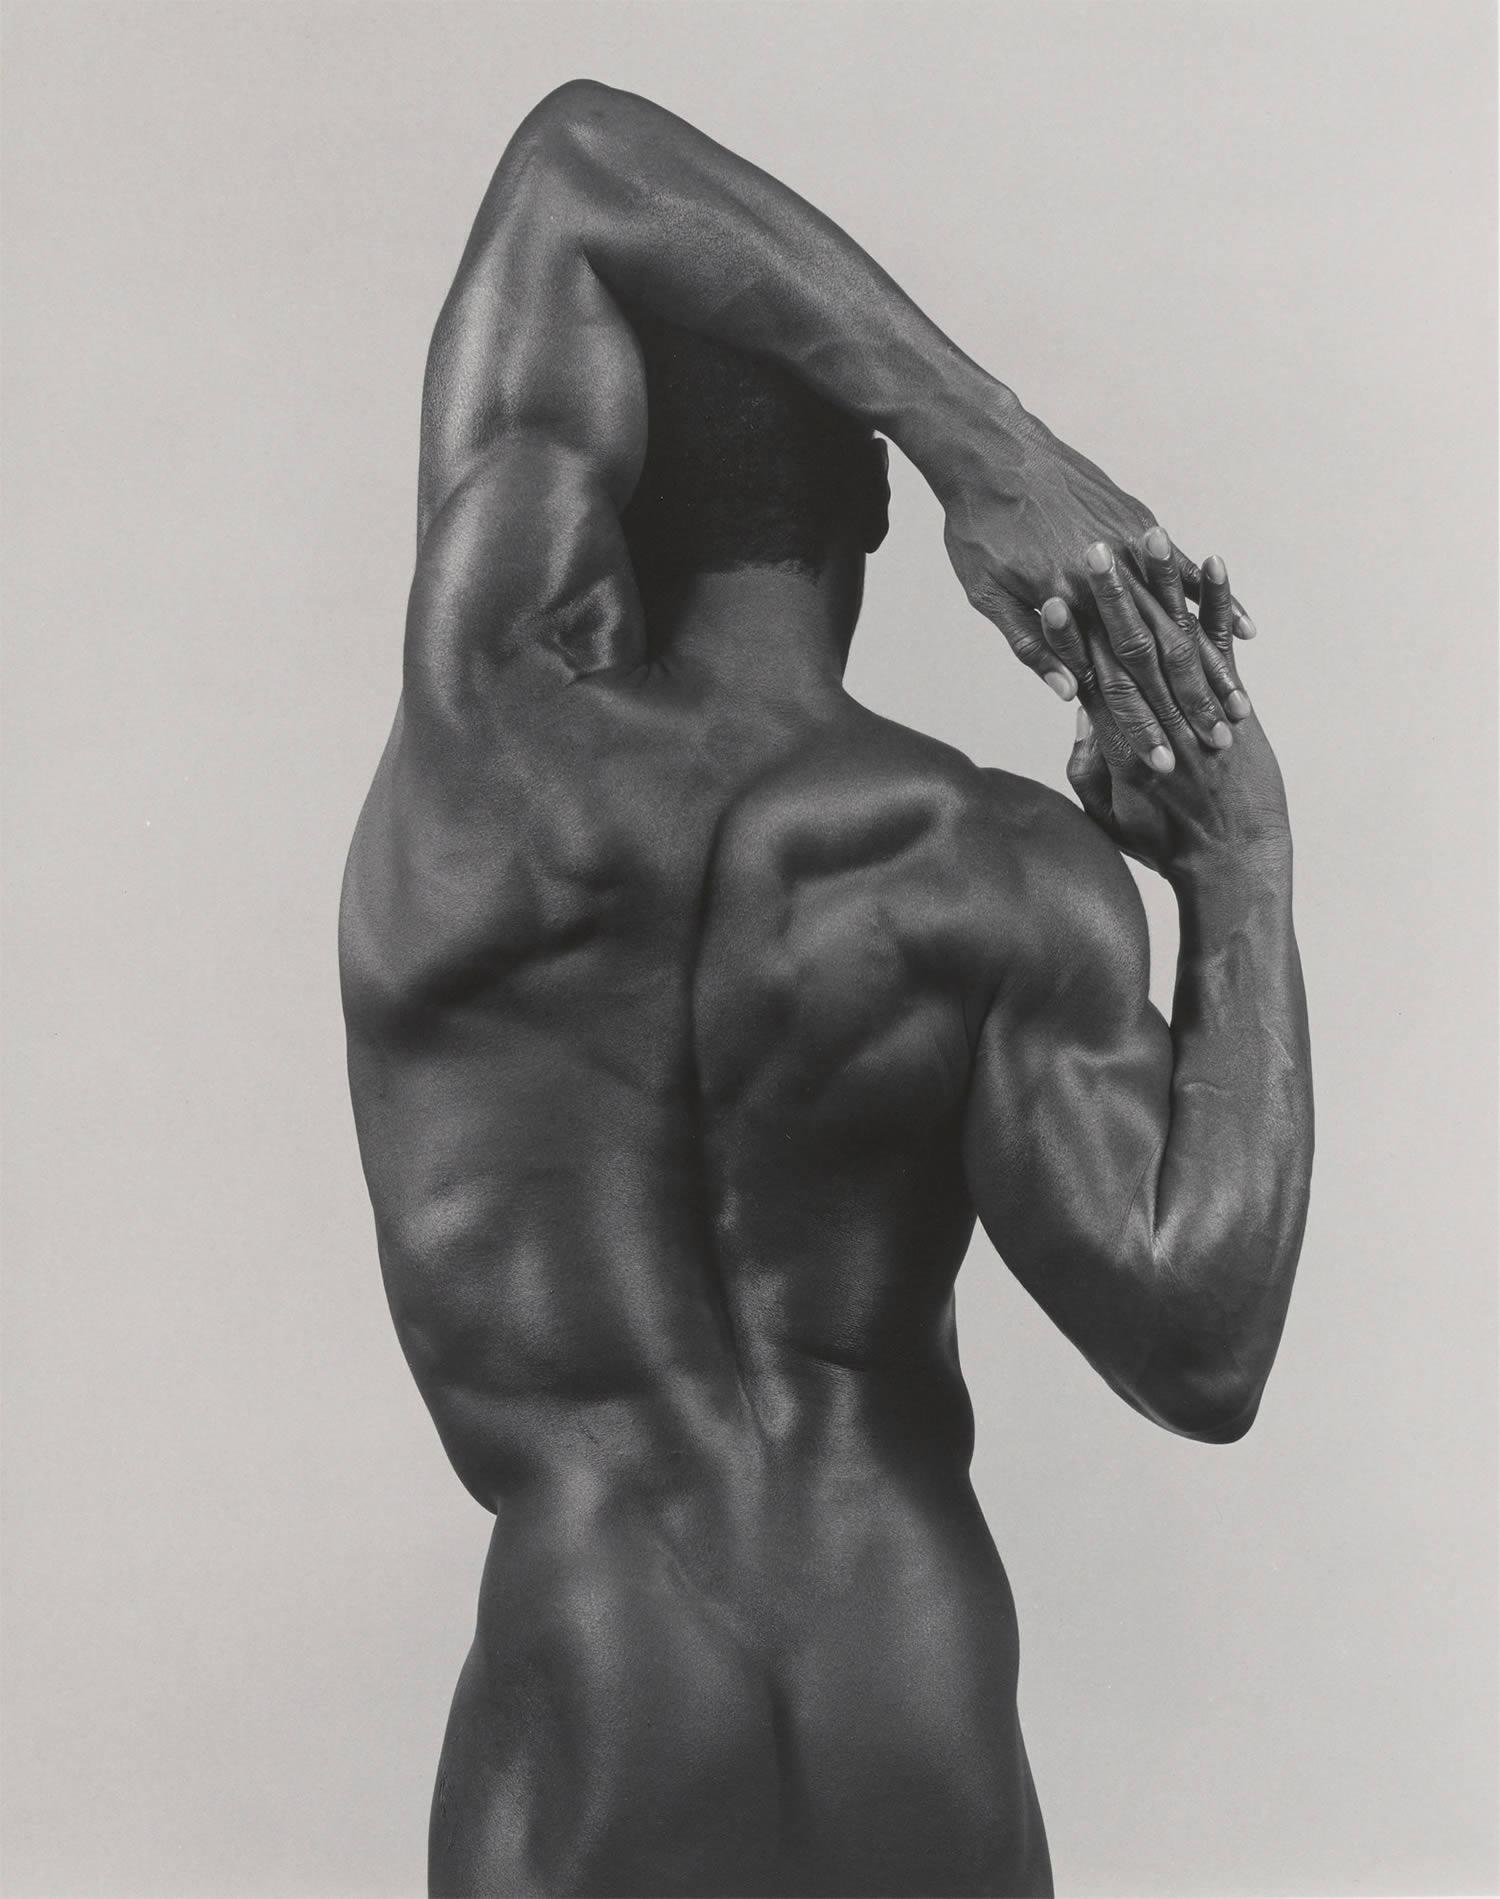 derrick cross, muscular man, photo © The Robert Mapplethorpe Foundation, Inc.